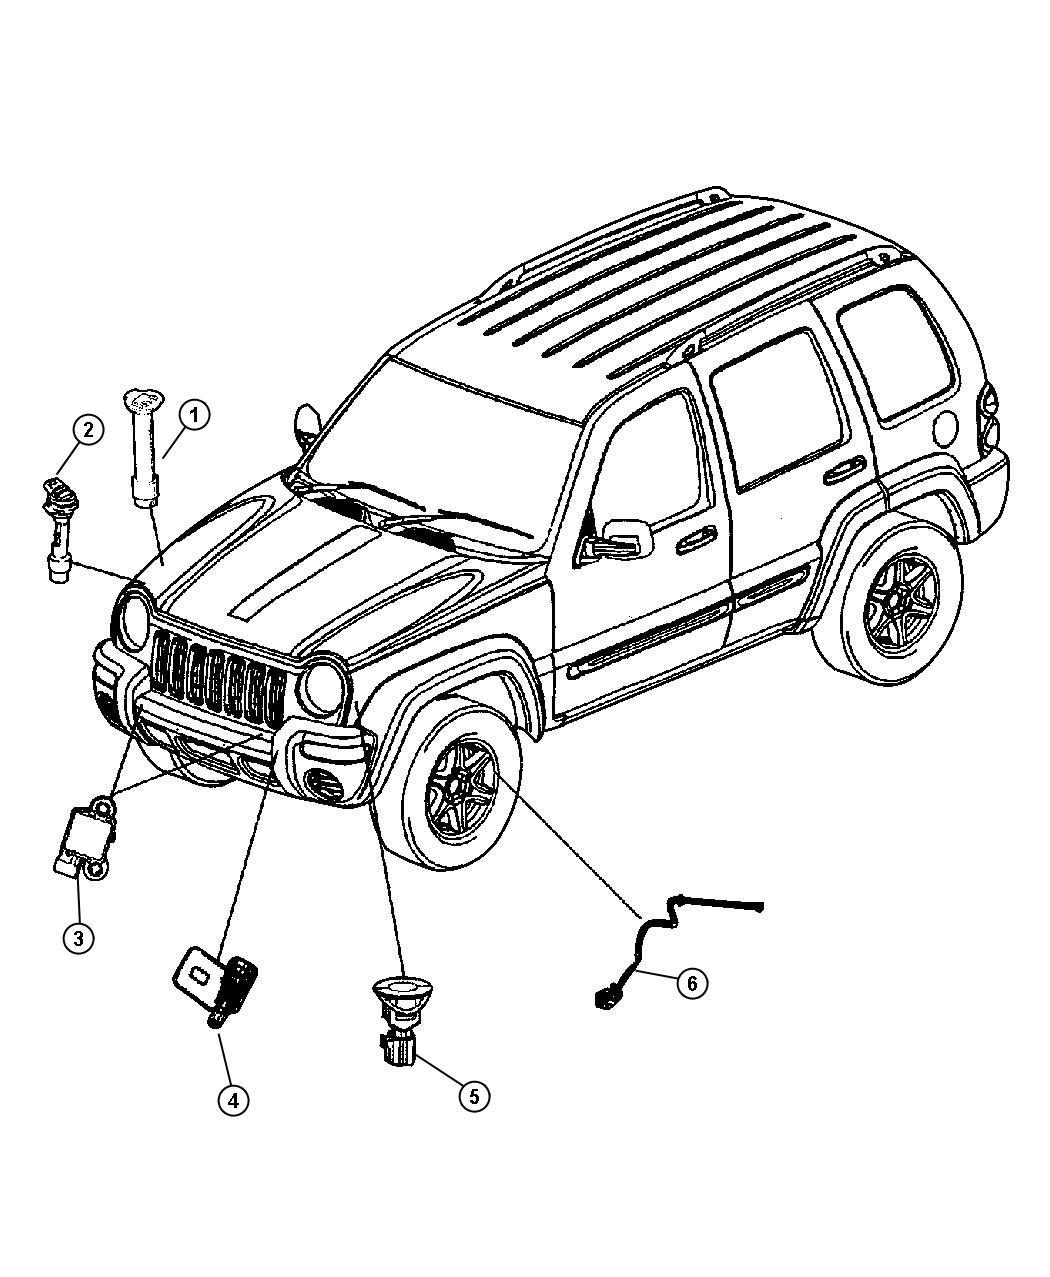 2005 jeep liberty fuse box diagram 2005 image 2005 jeep liberty ignition wiring diagram 2005 wiring diagram on 2005 jeep liberty fuse box diagram